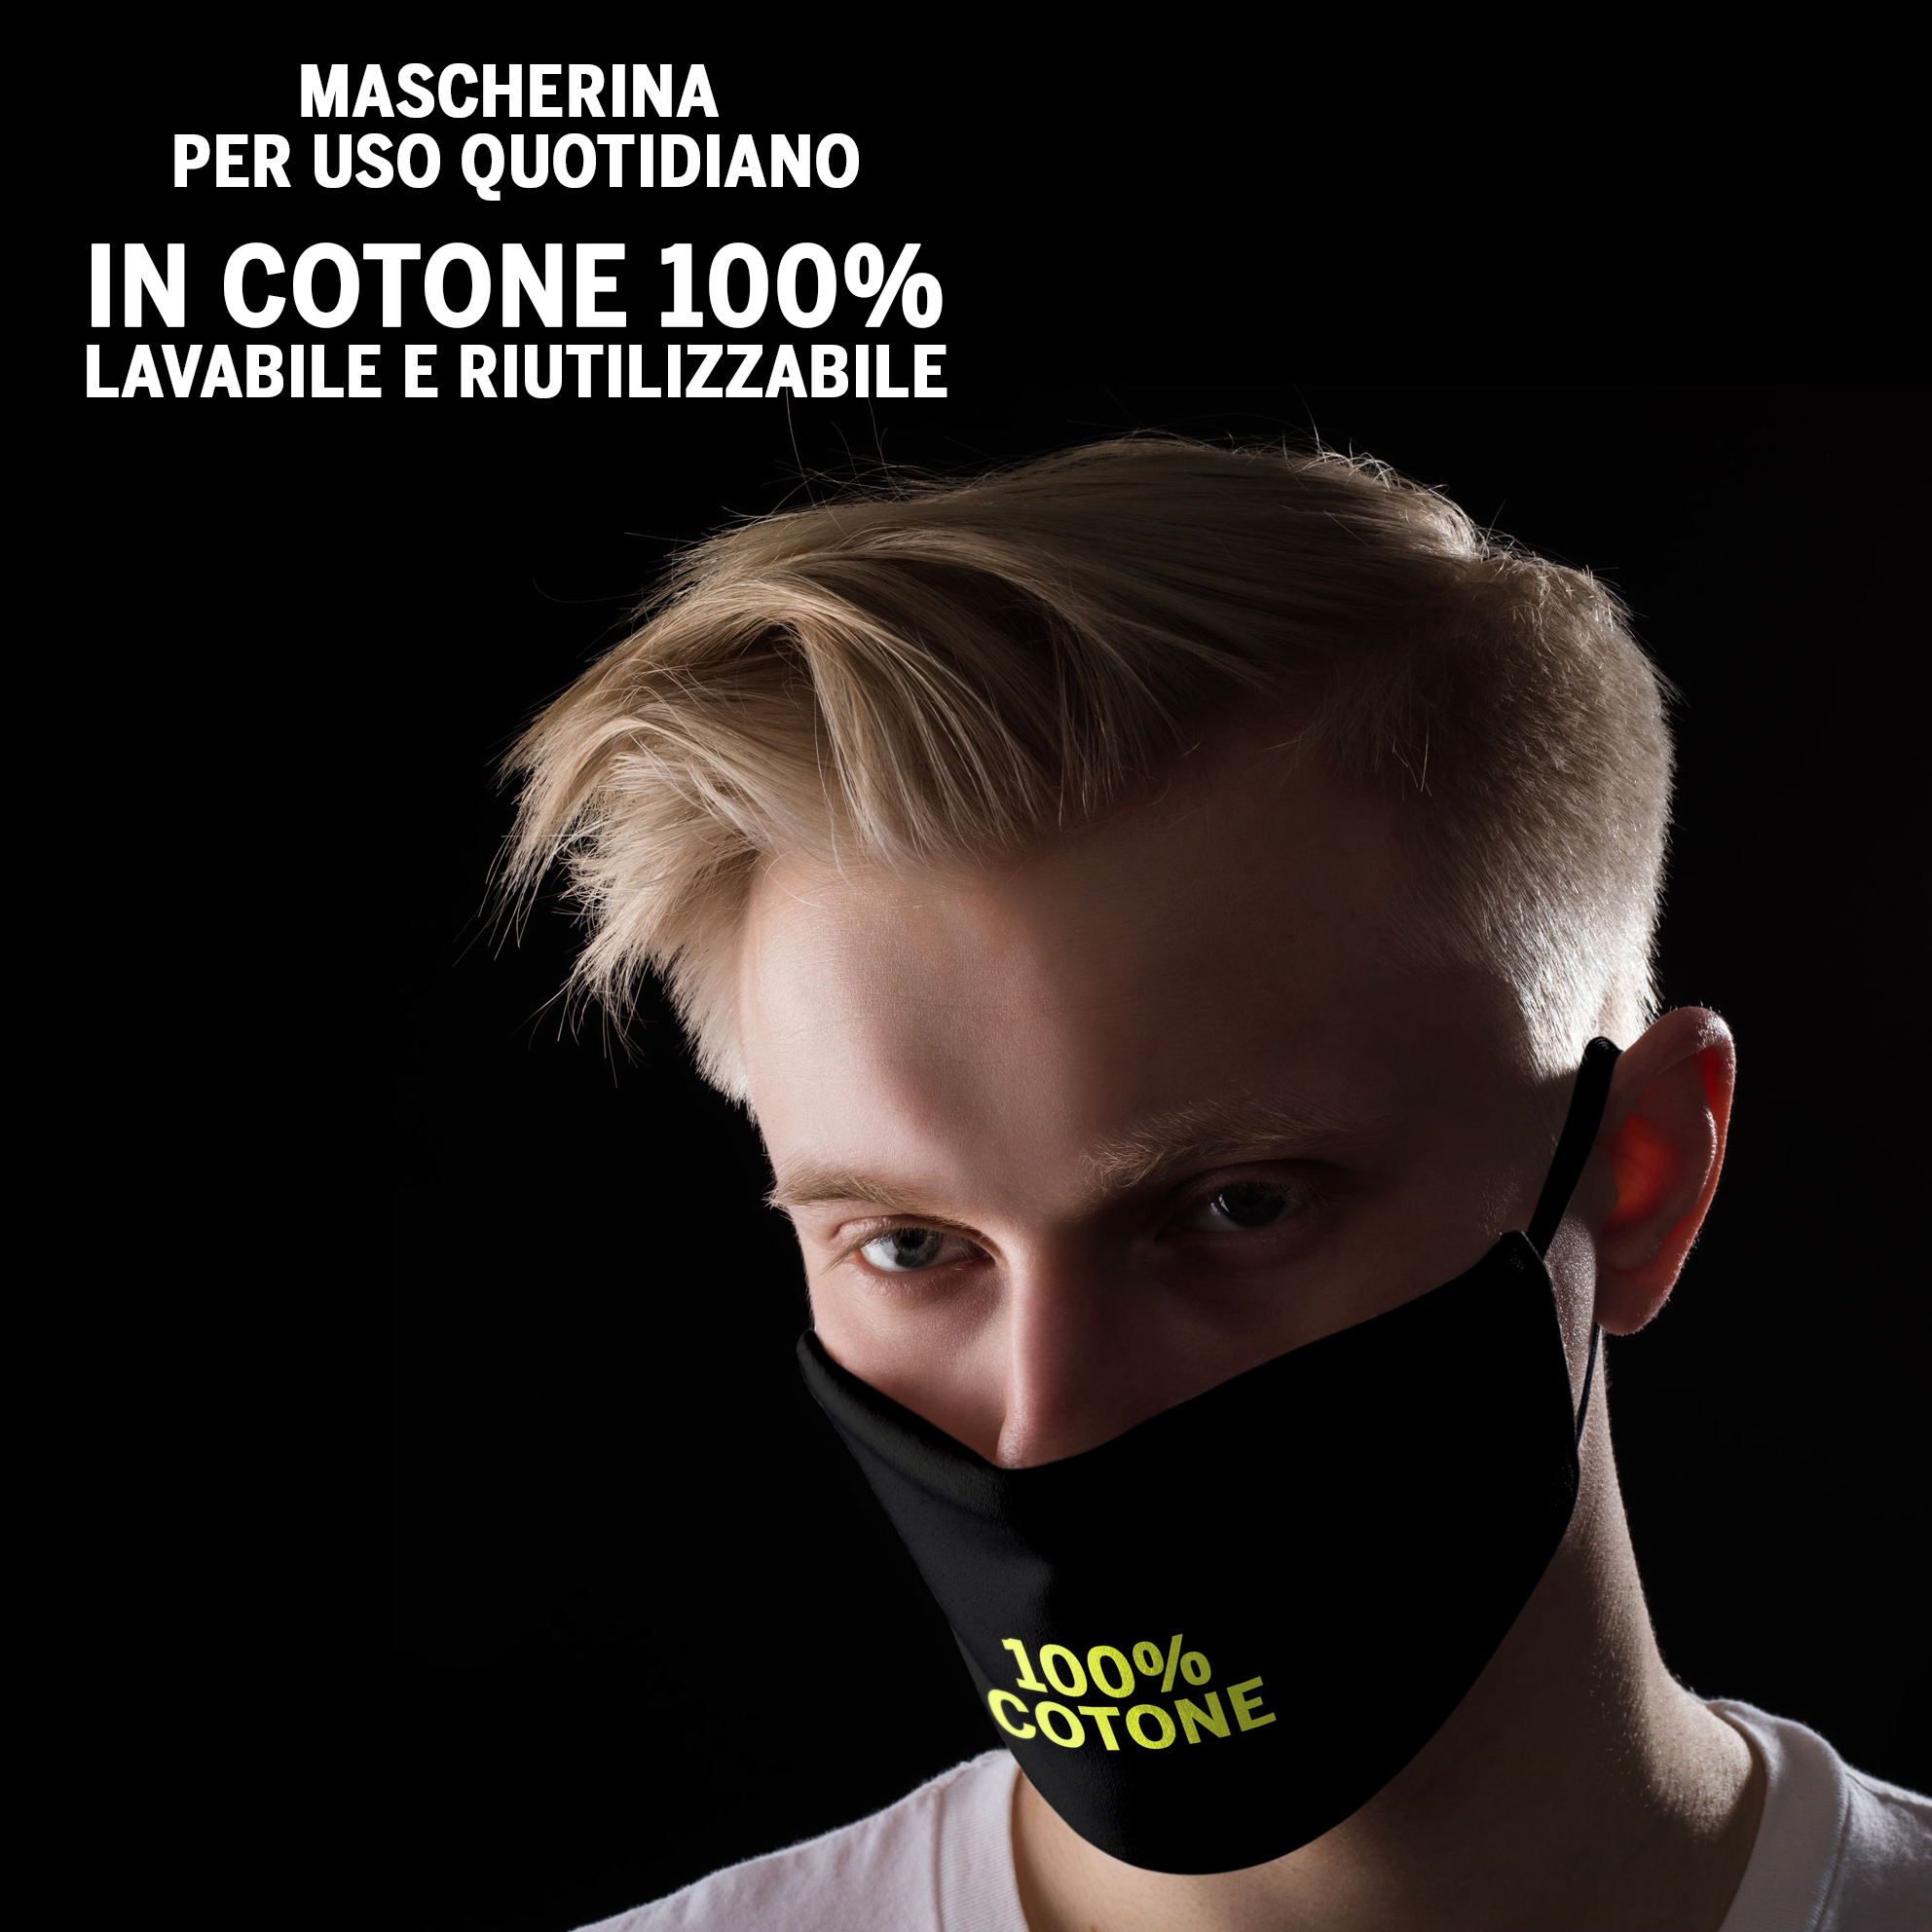 Mascherina Rossonera in cotone 2